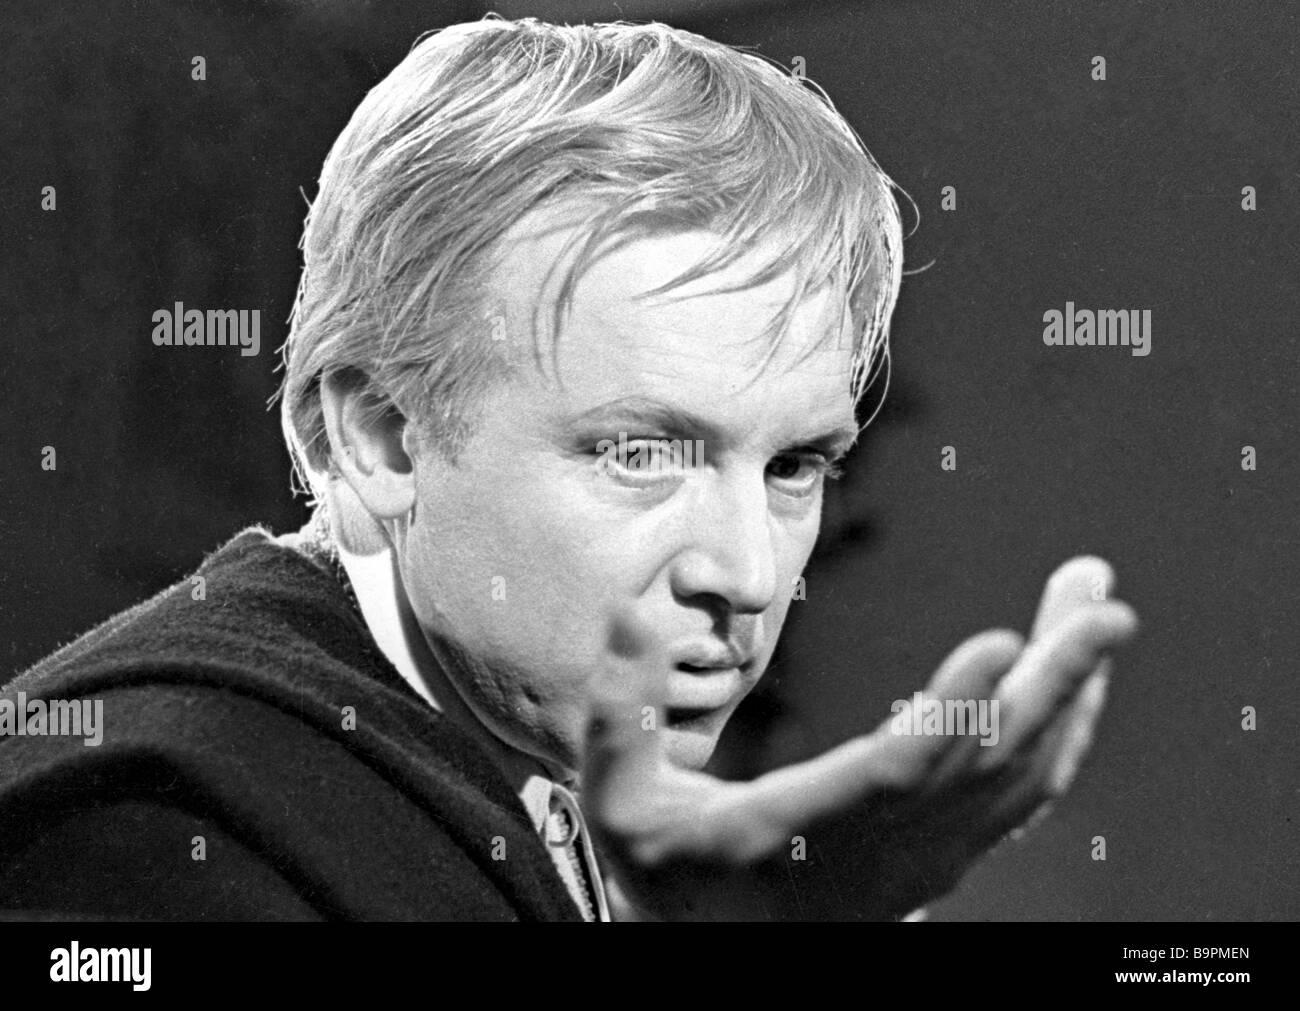 Innokenty Smoktunovsky as Hamlet in the film Hamlet - Stock Image